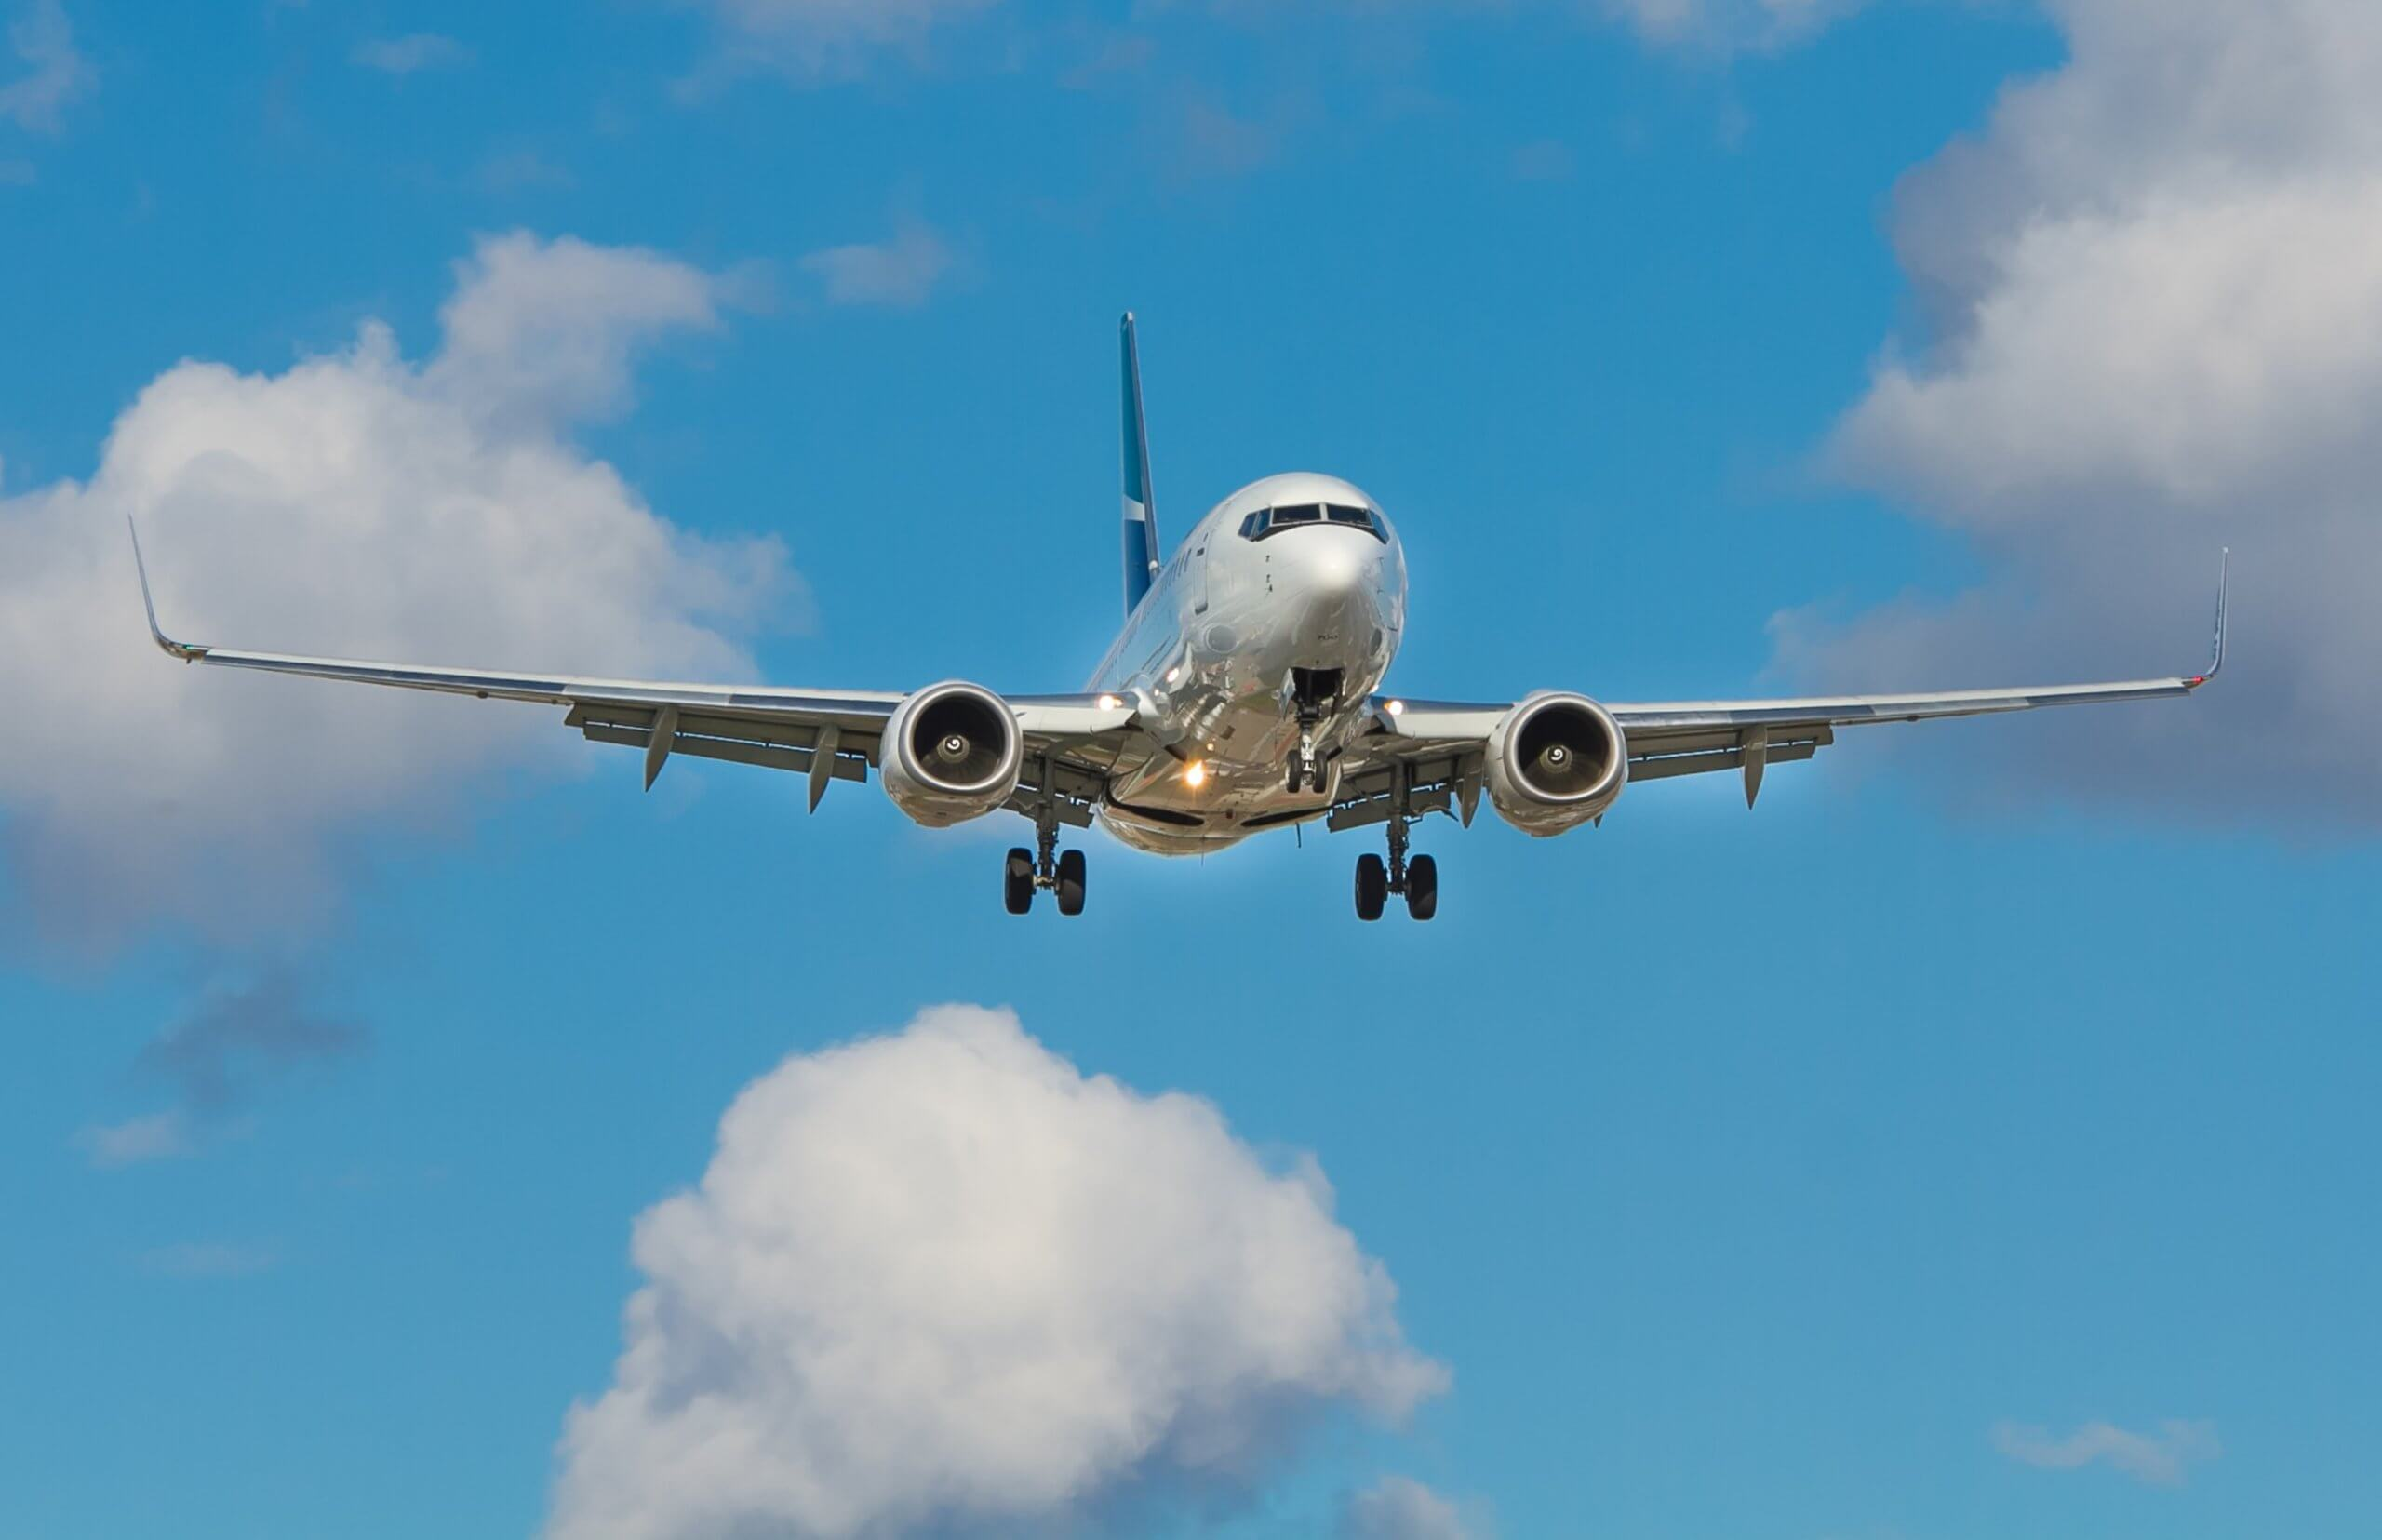 Airplane decending in the sky